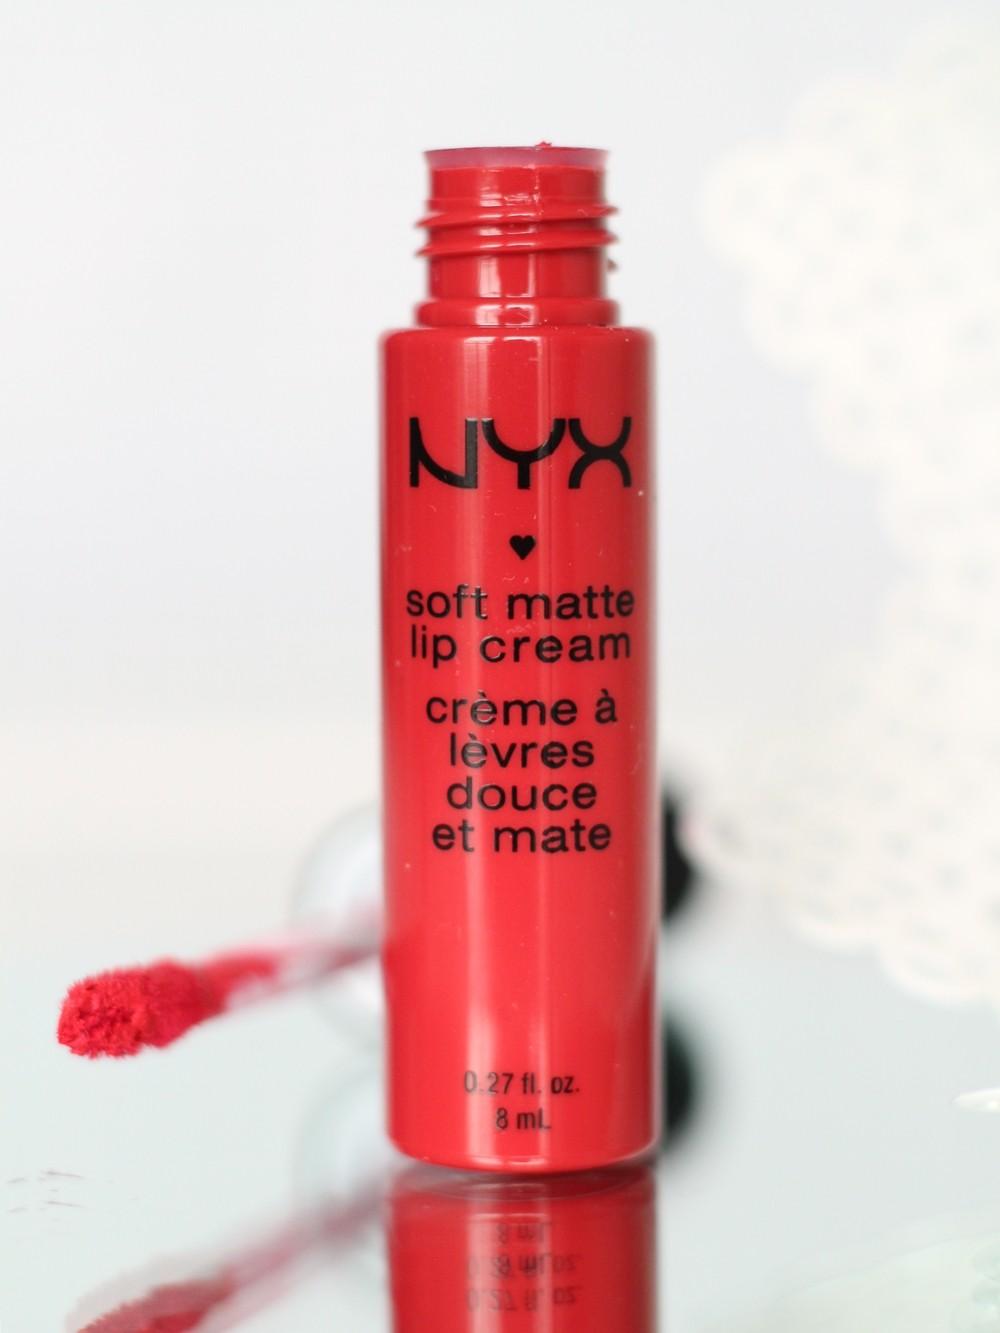 NYX Soft Matte Lip Cream Amsterdam 1